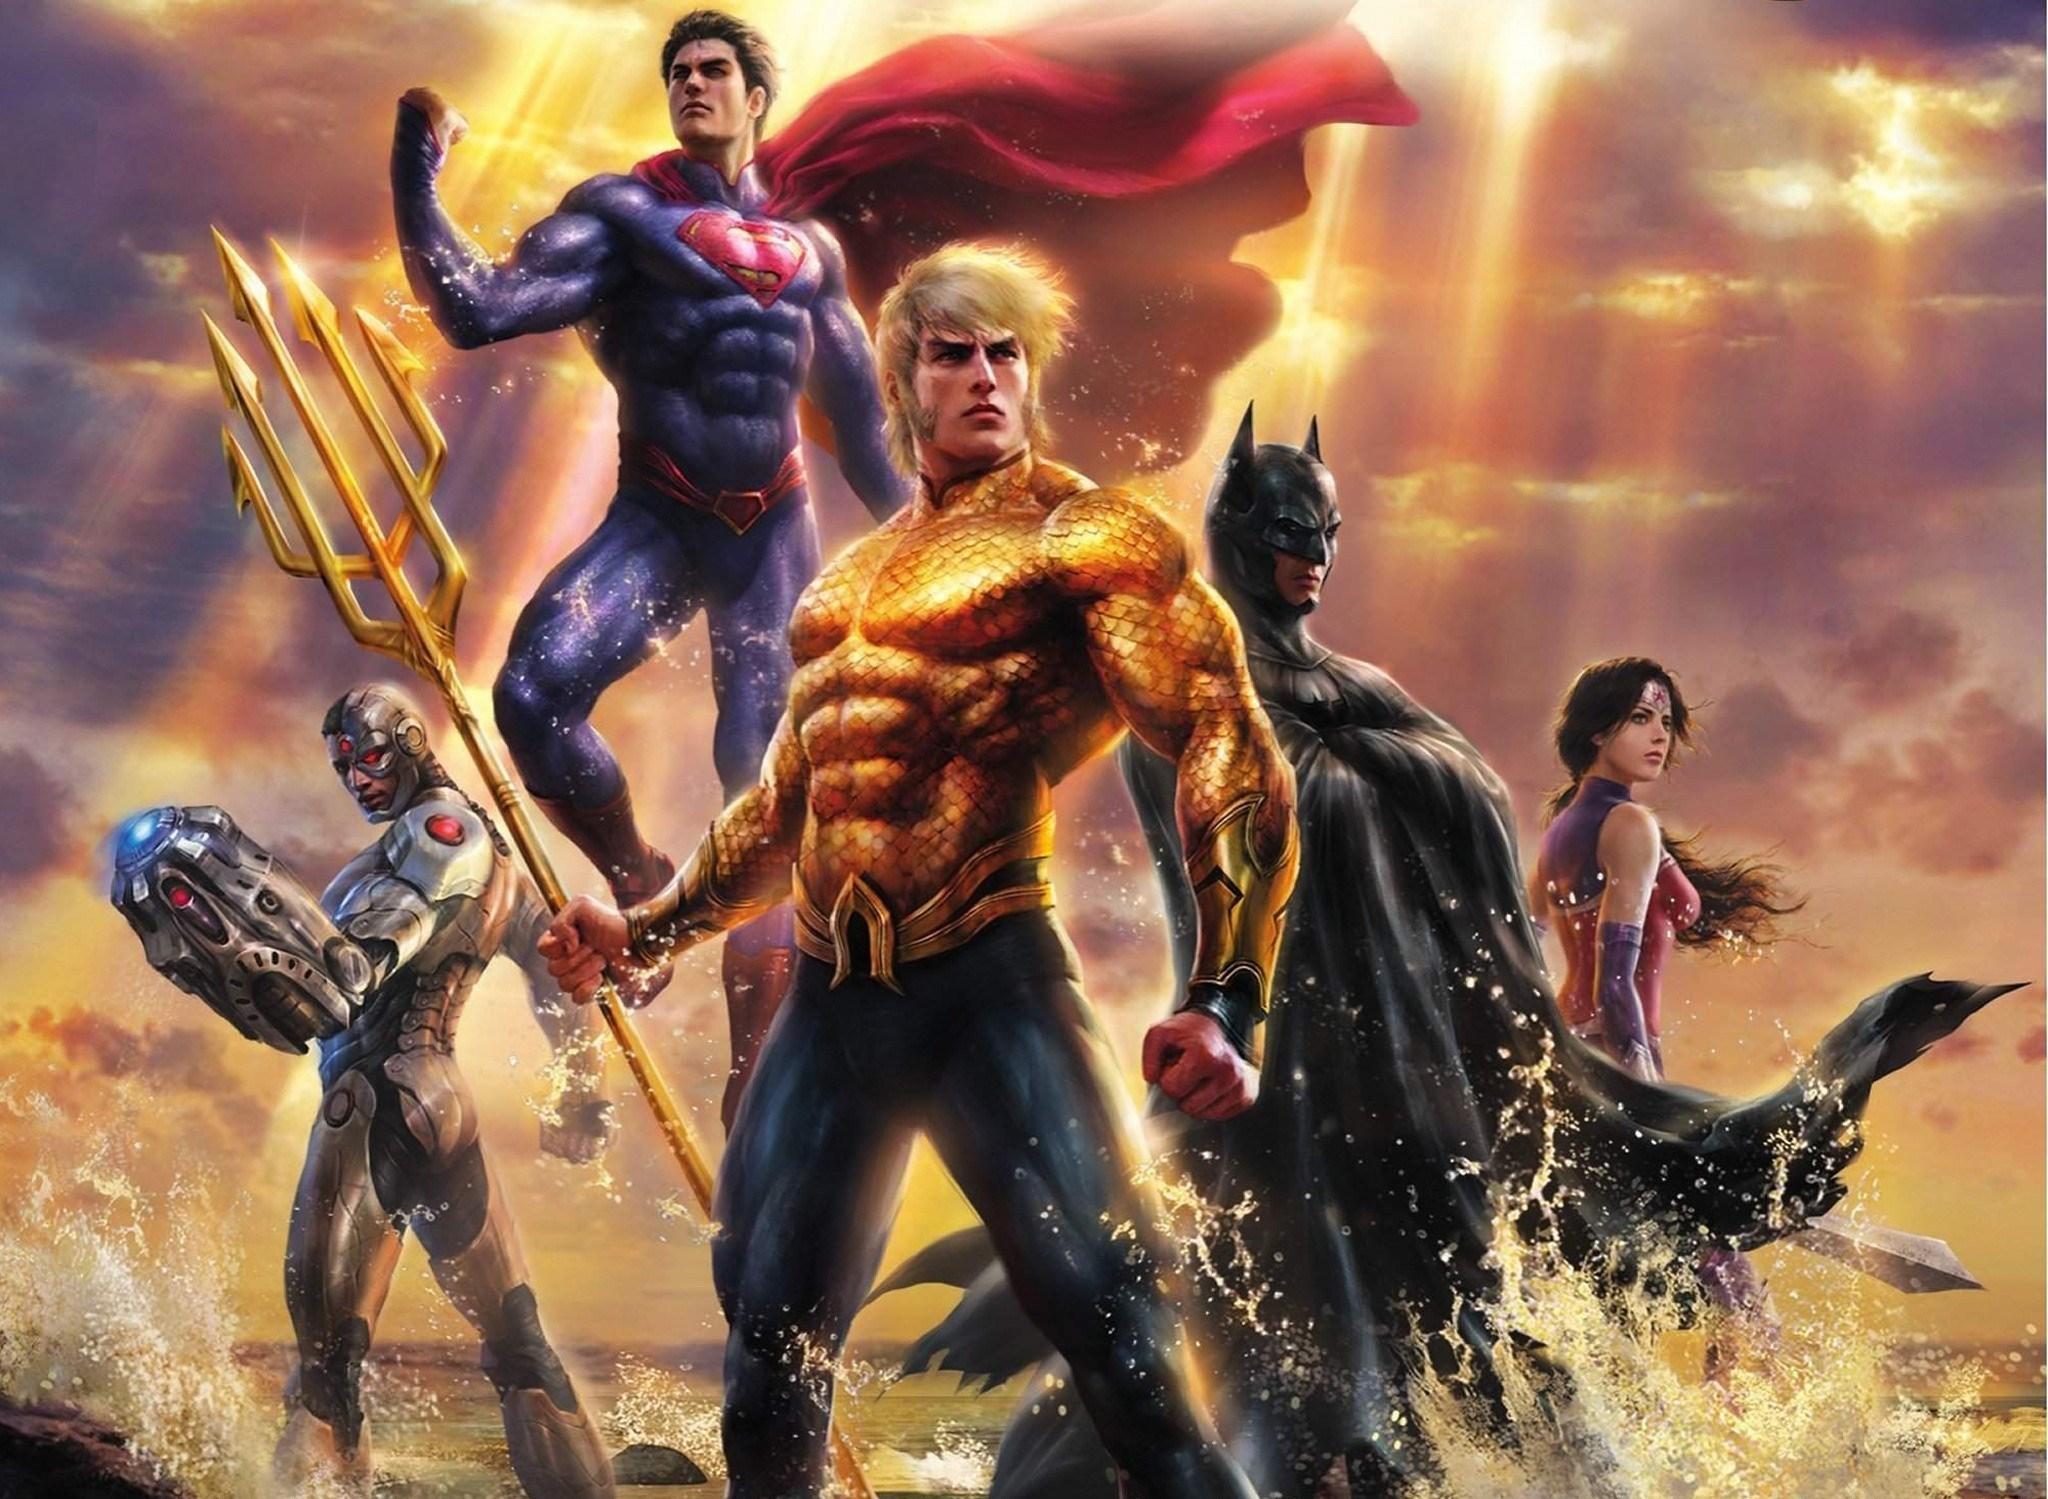 Hd wallpaper justice league - Wallpaper Justice League Throne Of Atlantis Aquaman Wonder Woman